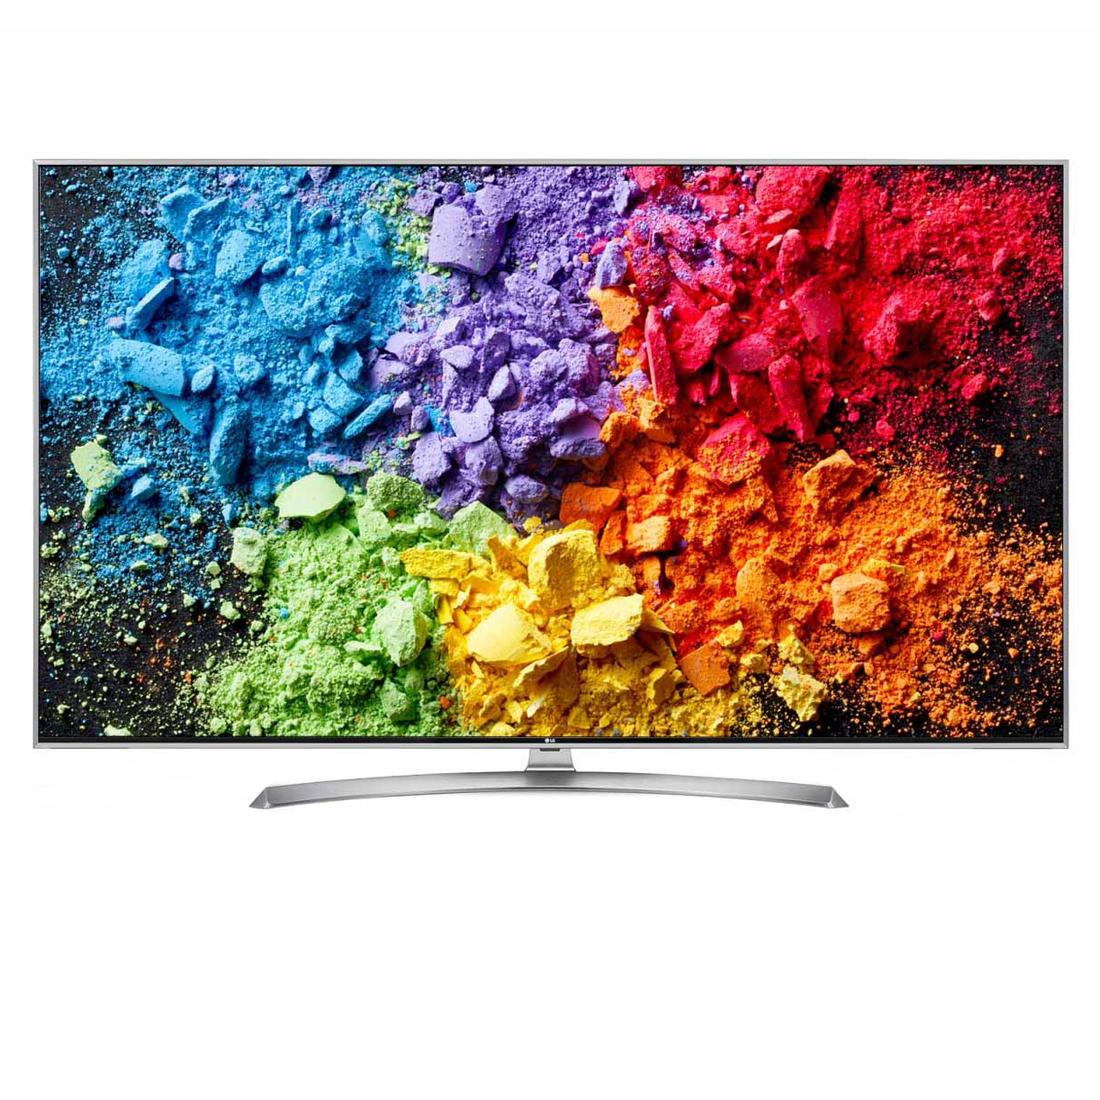 تلویزیون ال ای دی هوشمند ال جی مدل 49UK77000GI سایز 49 اینچ